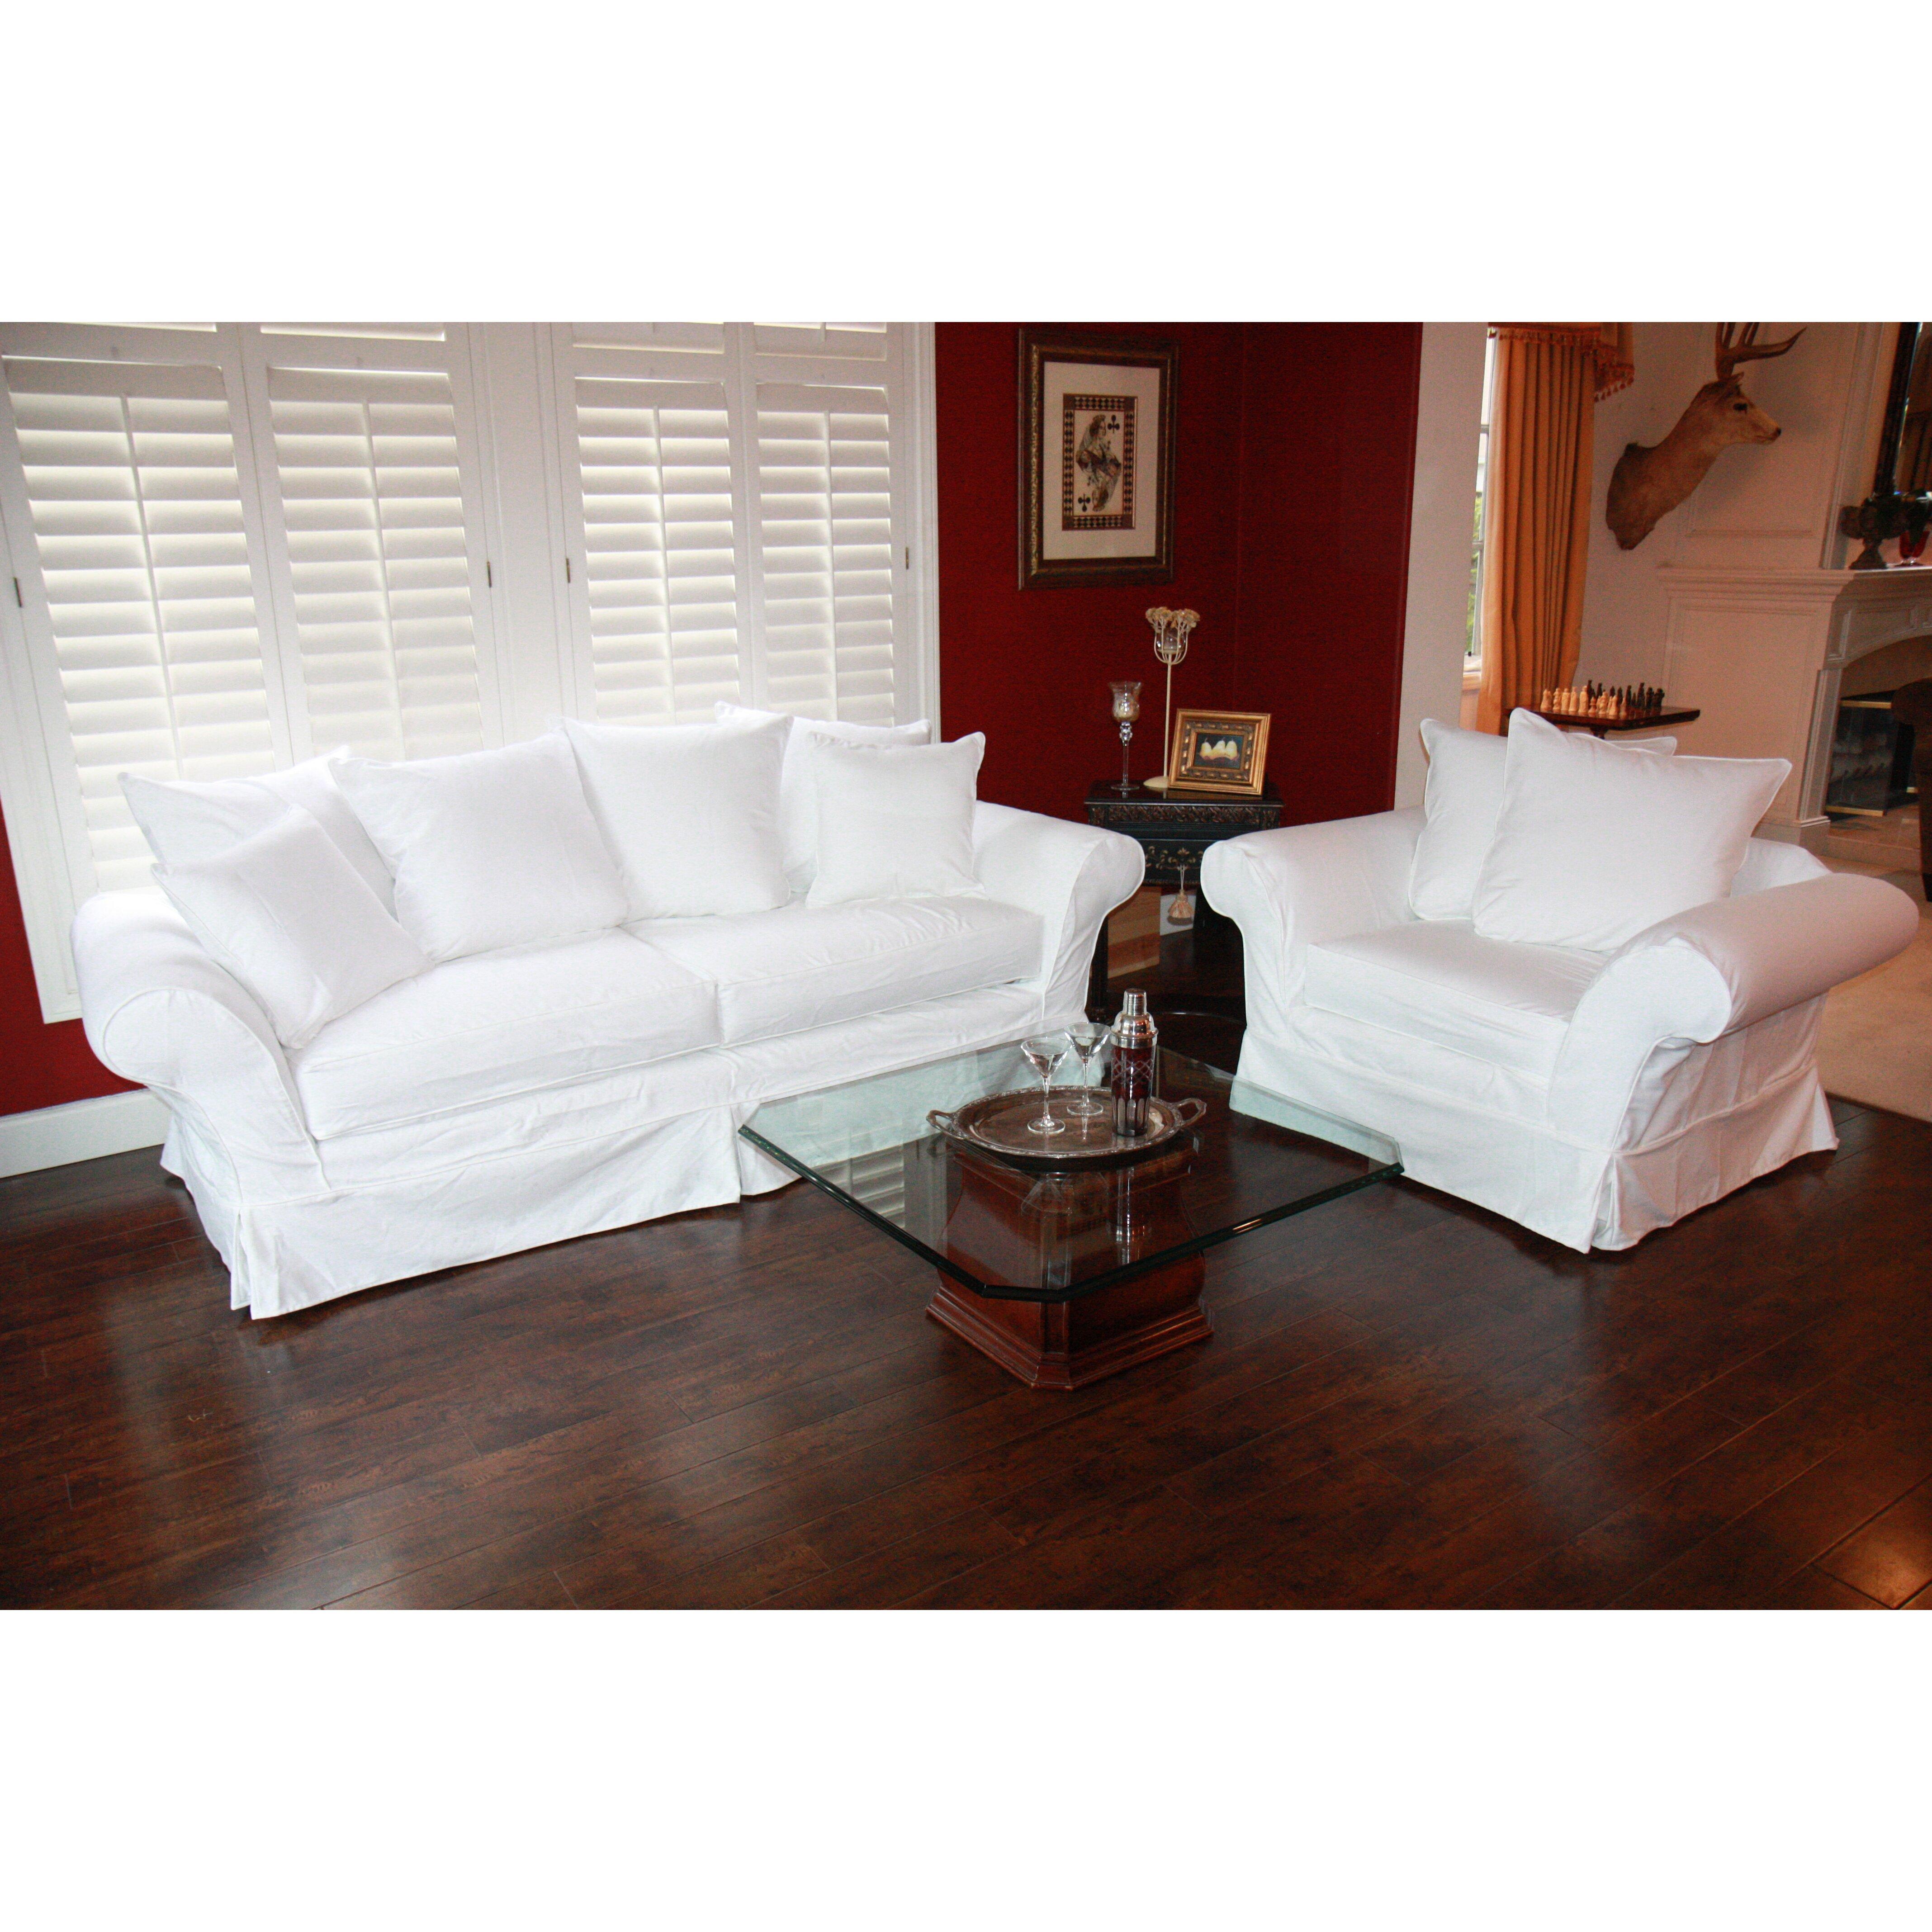 Huntington Industries Ridgeport Cotton Chair Reviews Wayfair